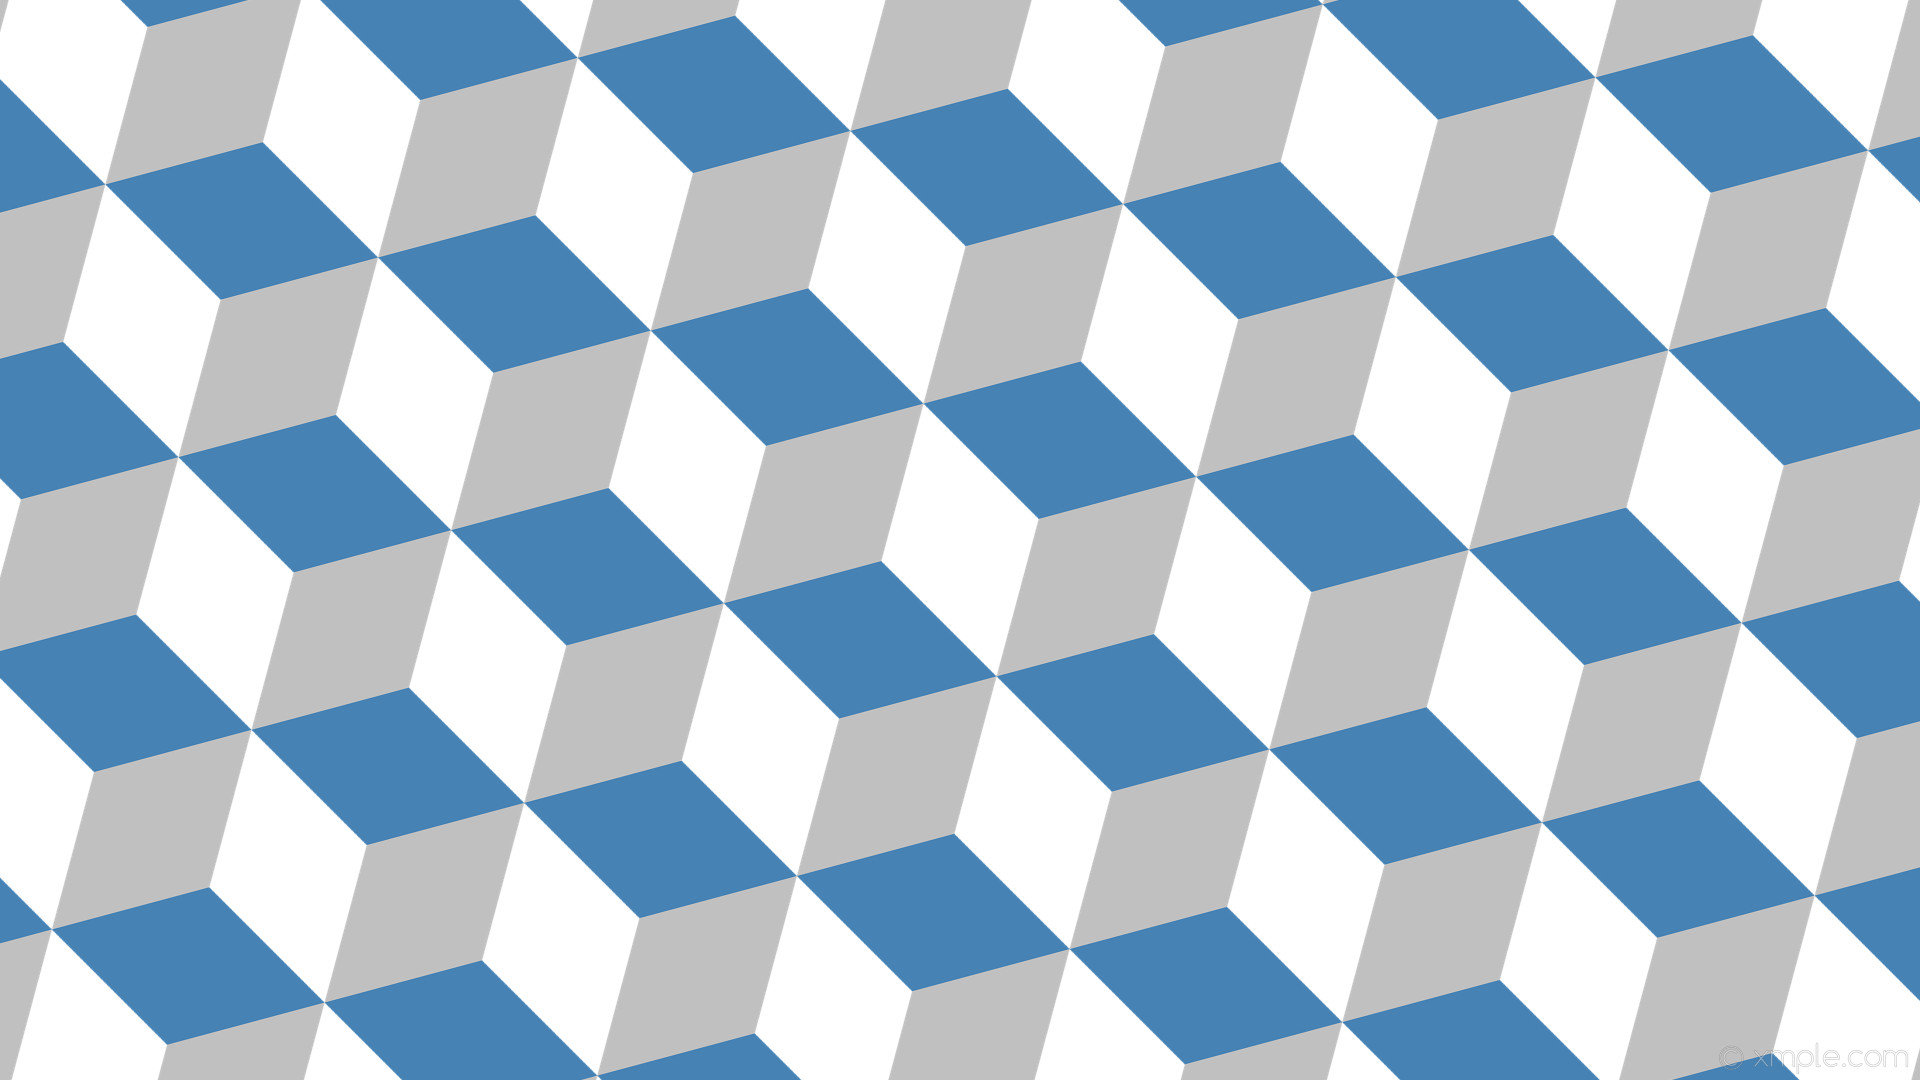 wallpaper blue grey 3d cubes white silver steel blue #ffffff #c0c0c0  #4682b4 285